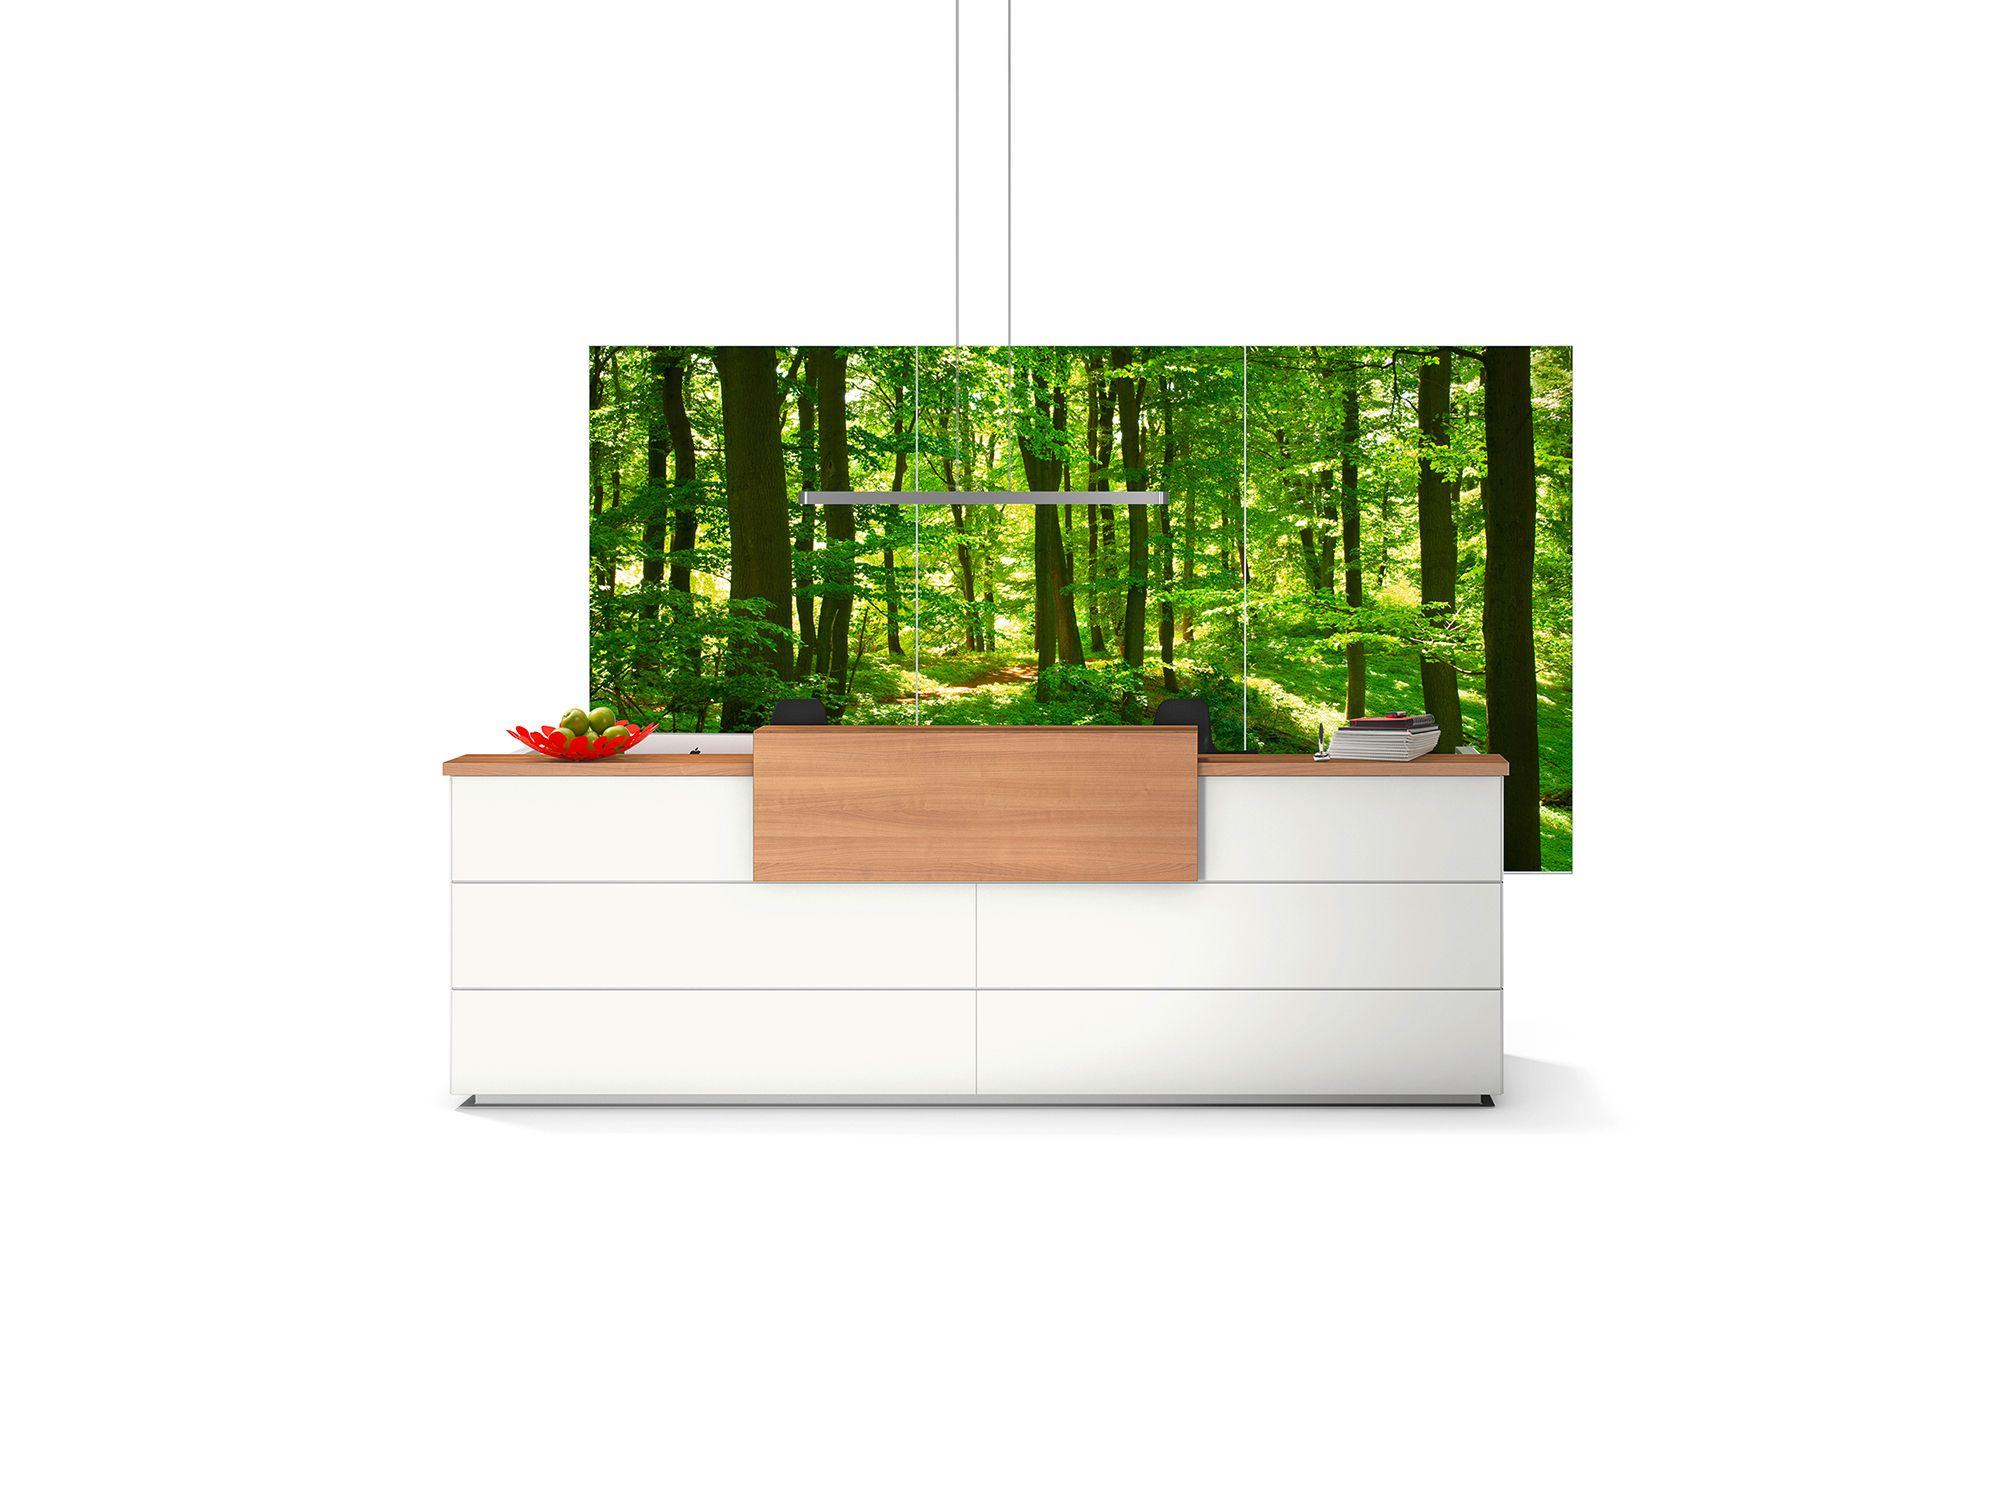 Fantastisch Wini Büromöbel Preise Galerie - Die besten ...